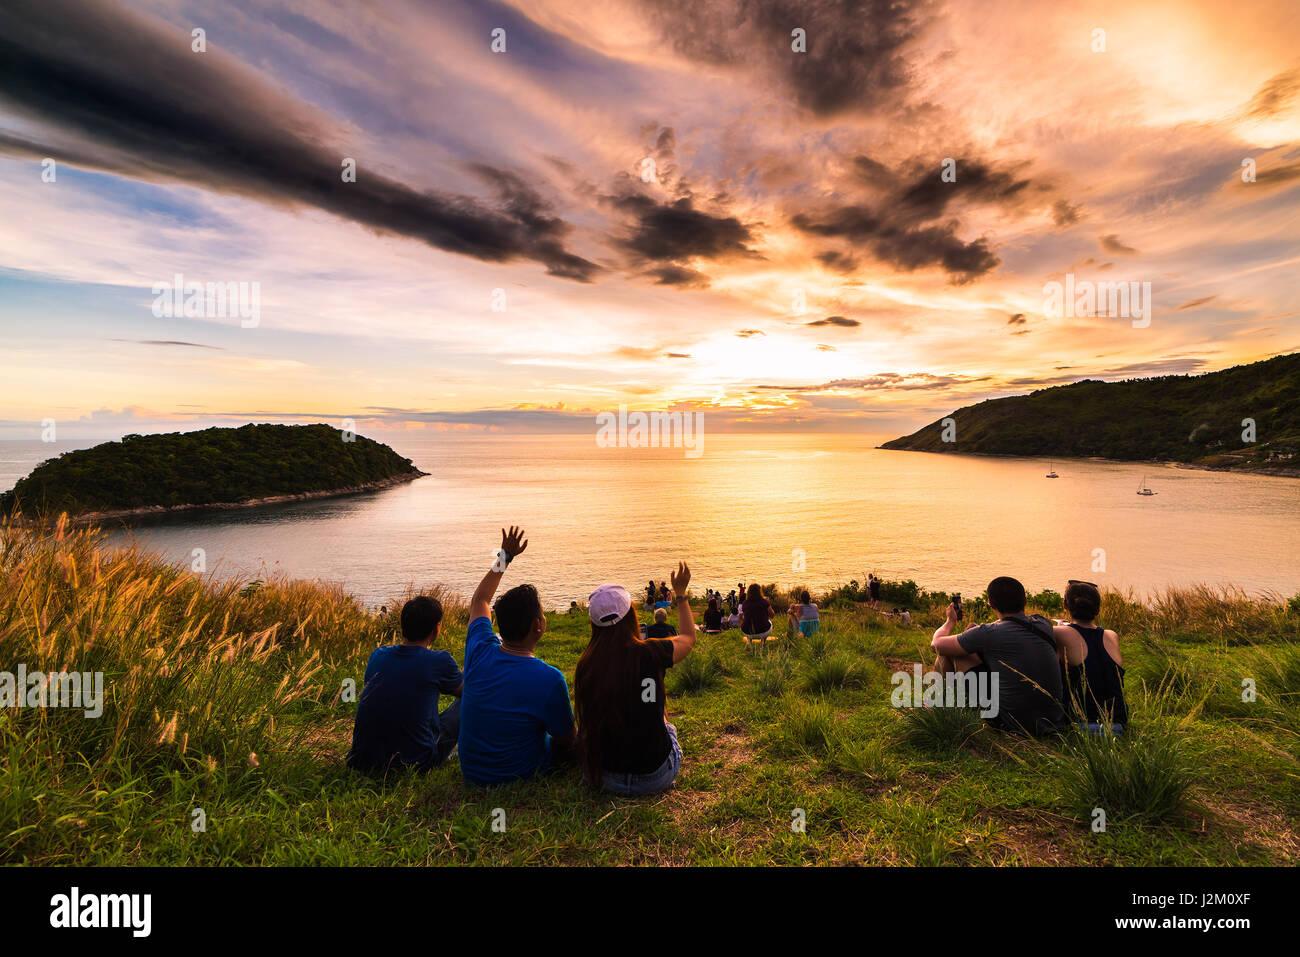 Watching Sunrise Tropical Beach Stock Photos & Watching ...